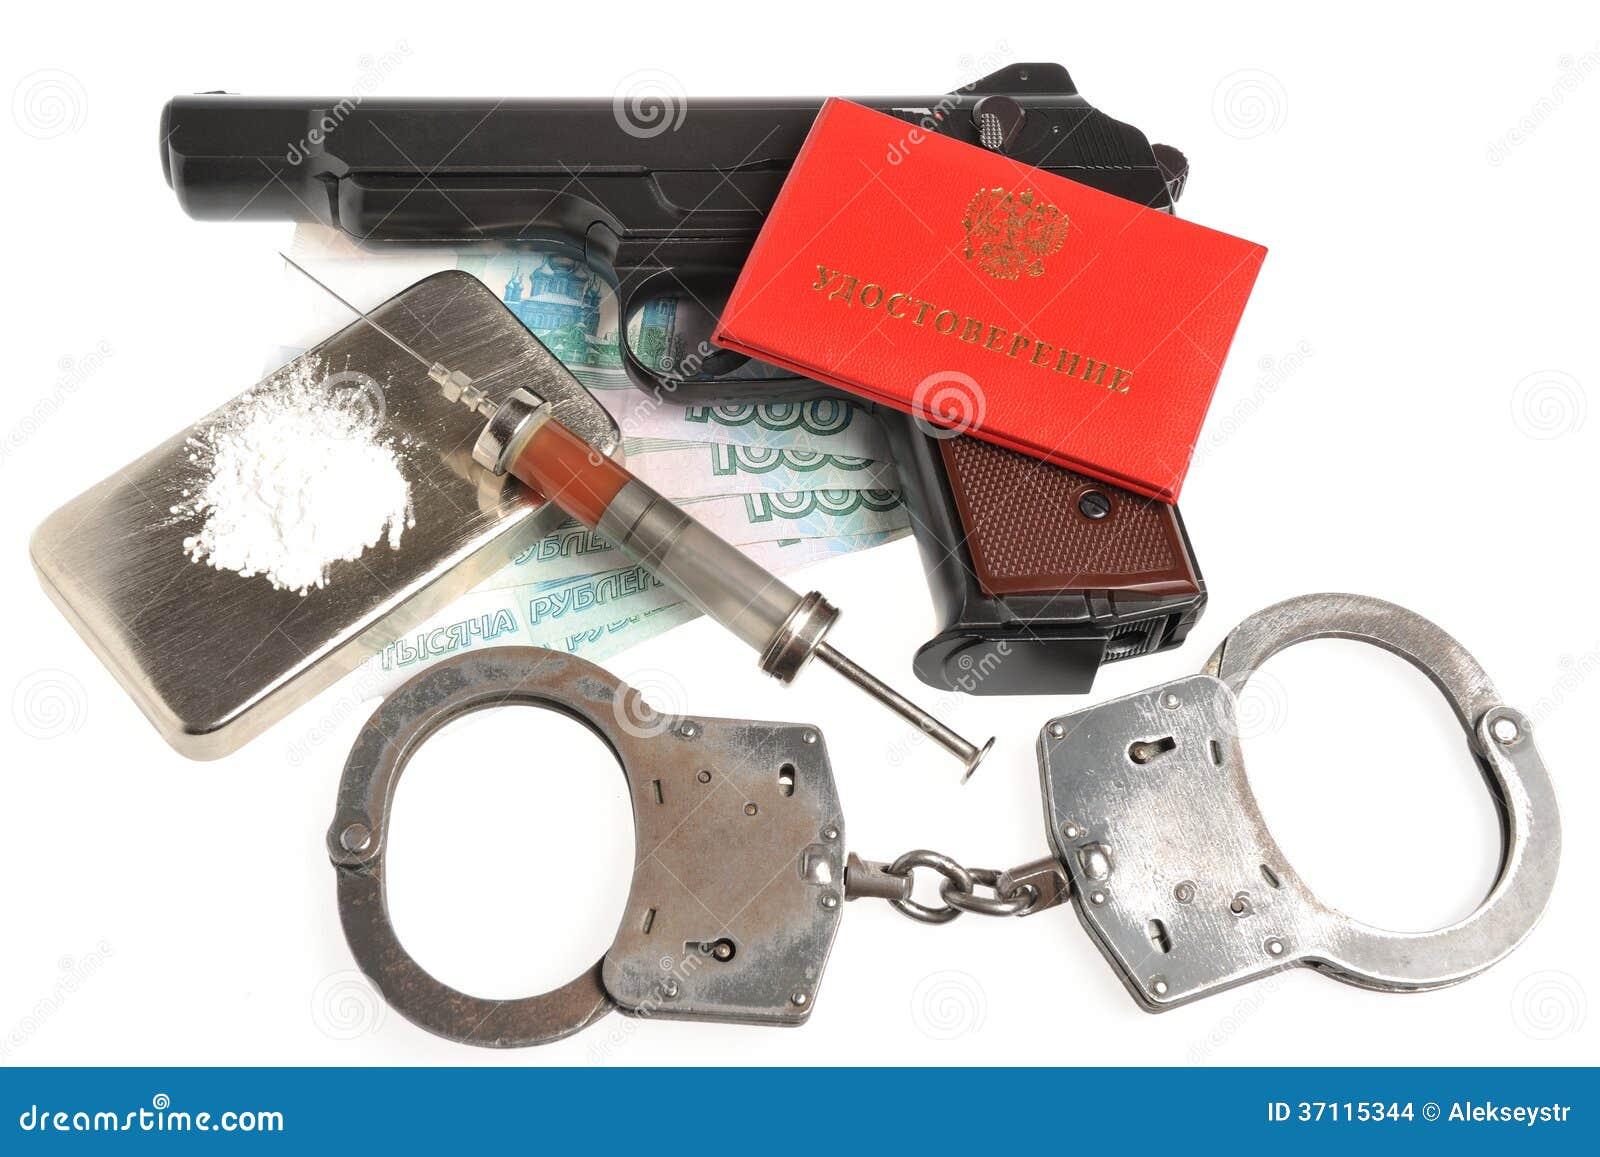 drogues syrine avec le sang pistolet menottes document d 39 identit images stock image 37115344. Black Bedroom Furniture Sets. Home Design Ideas